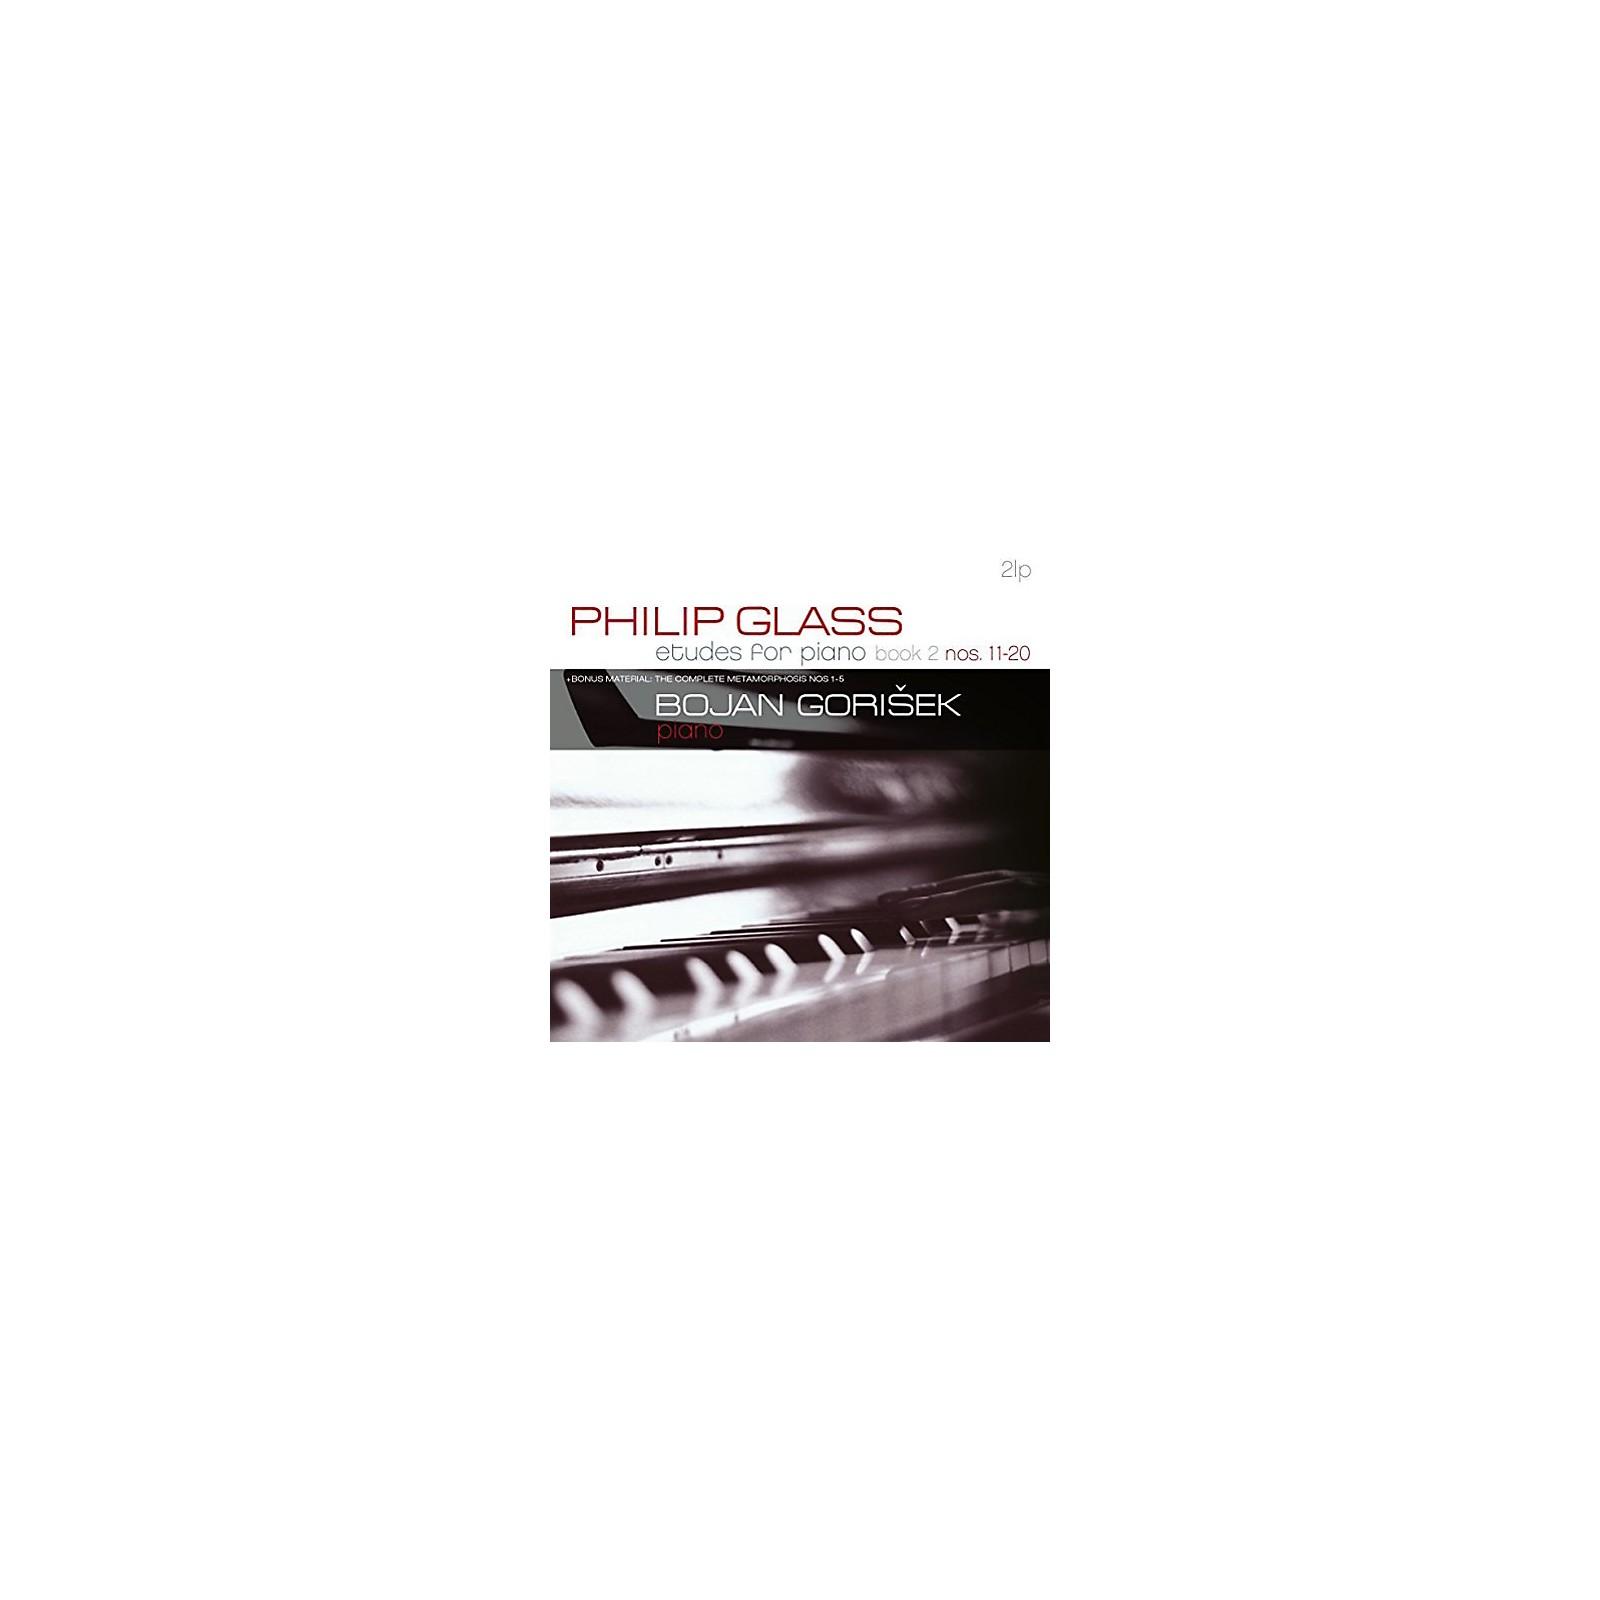 Alliance Philip Glass: Etudes For Piano 11-20 / Metamorphosis 1-5